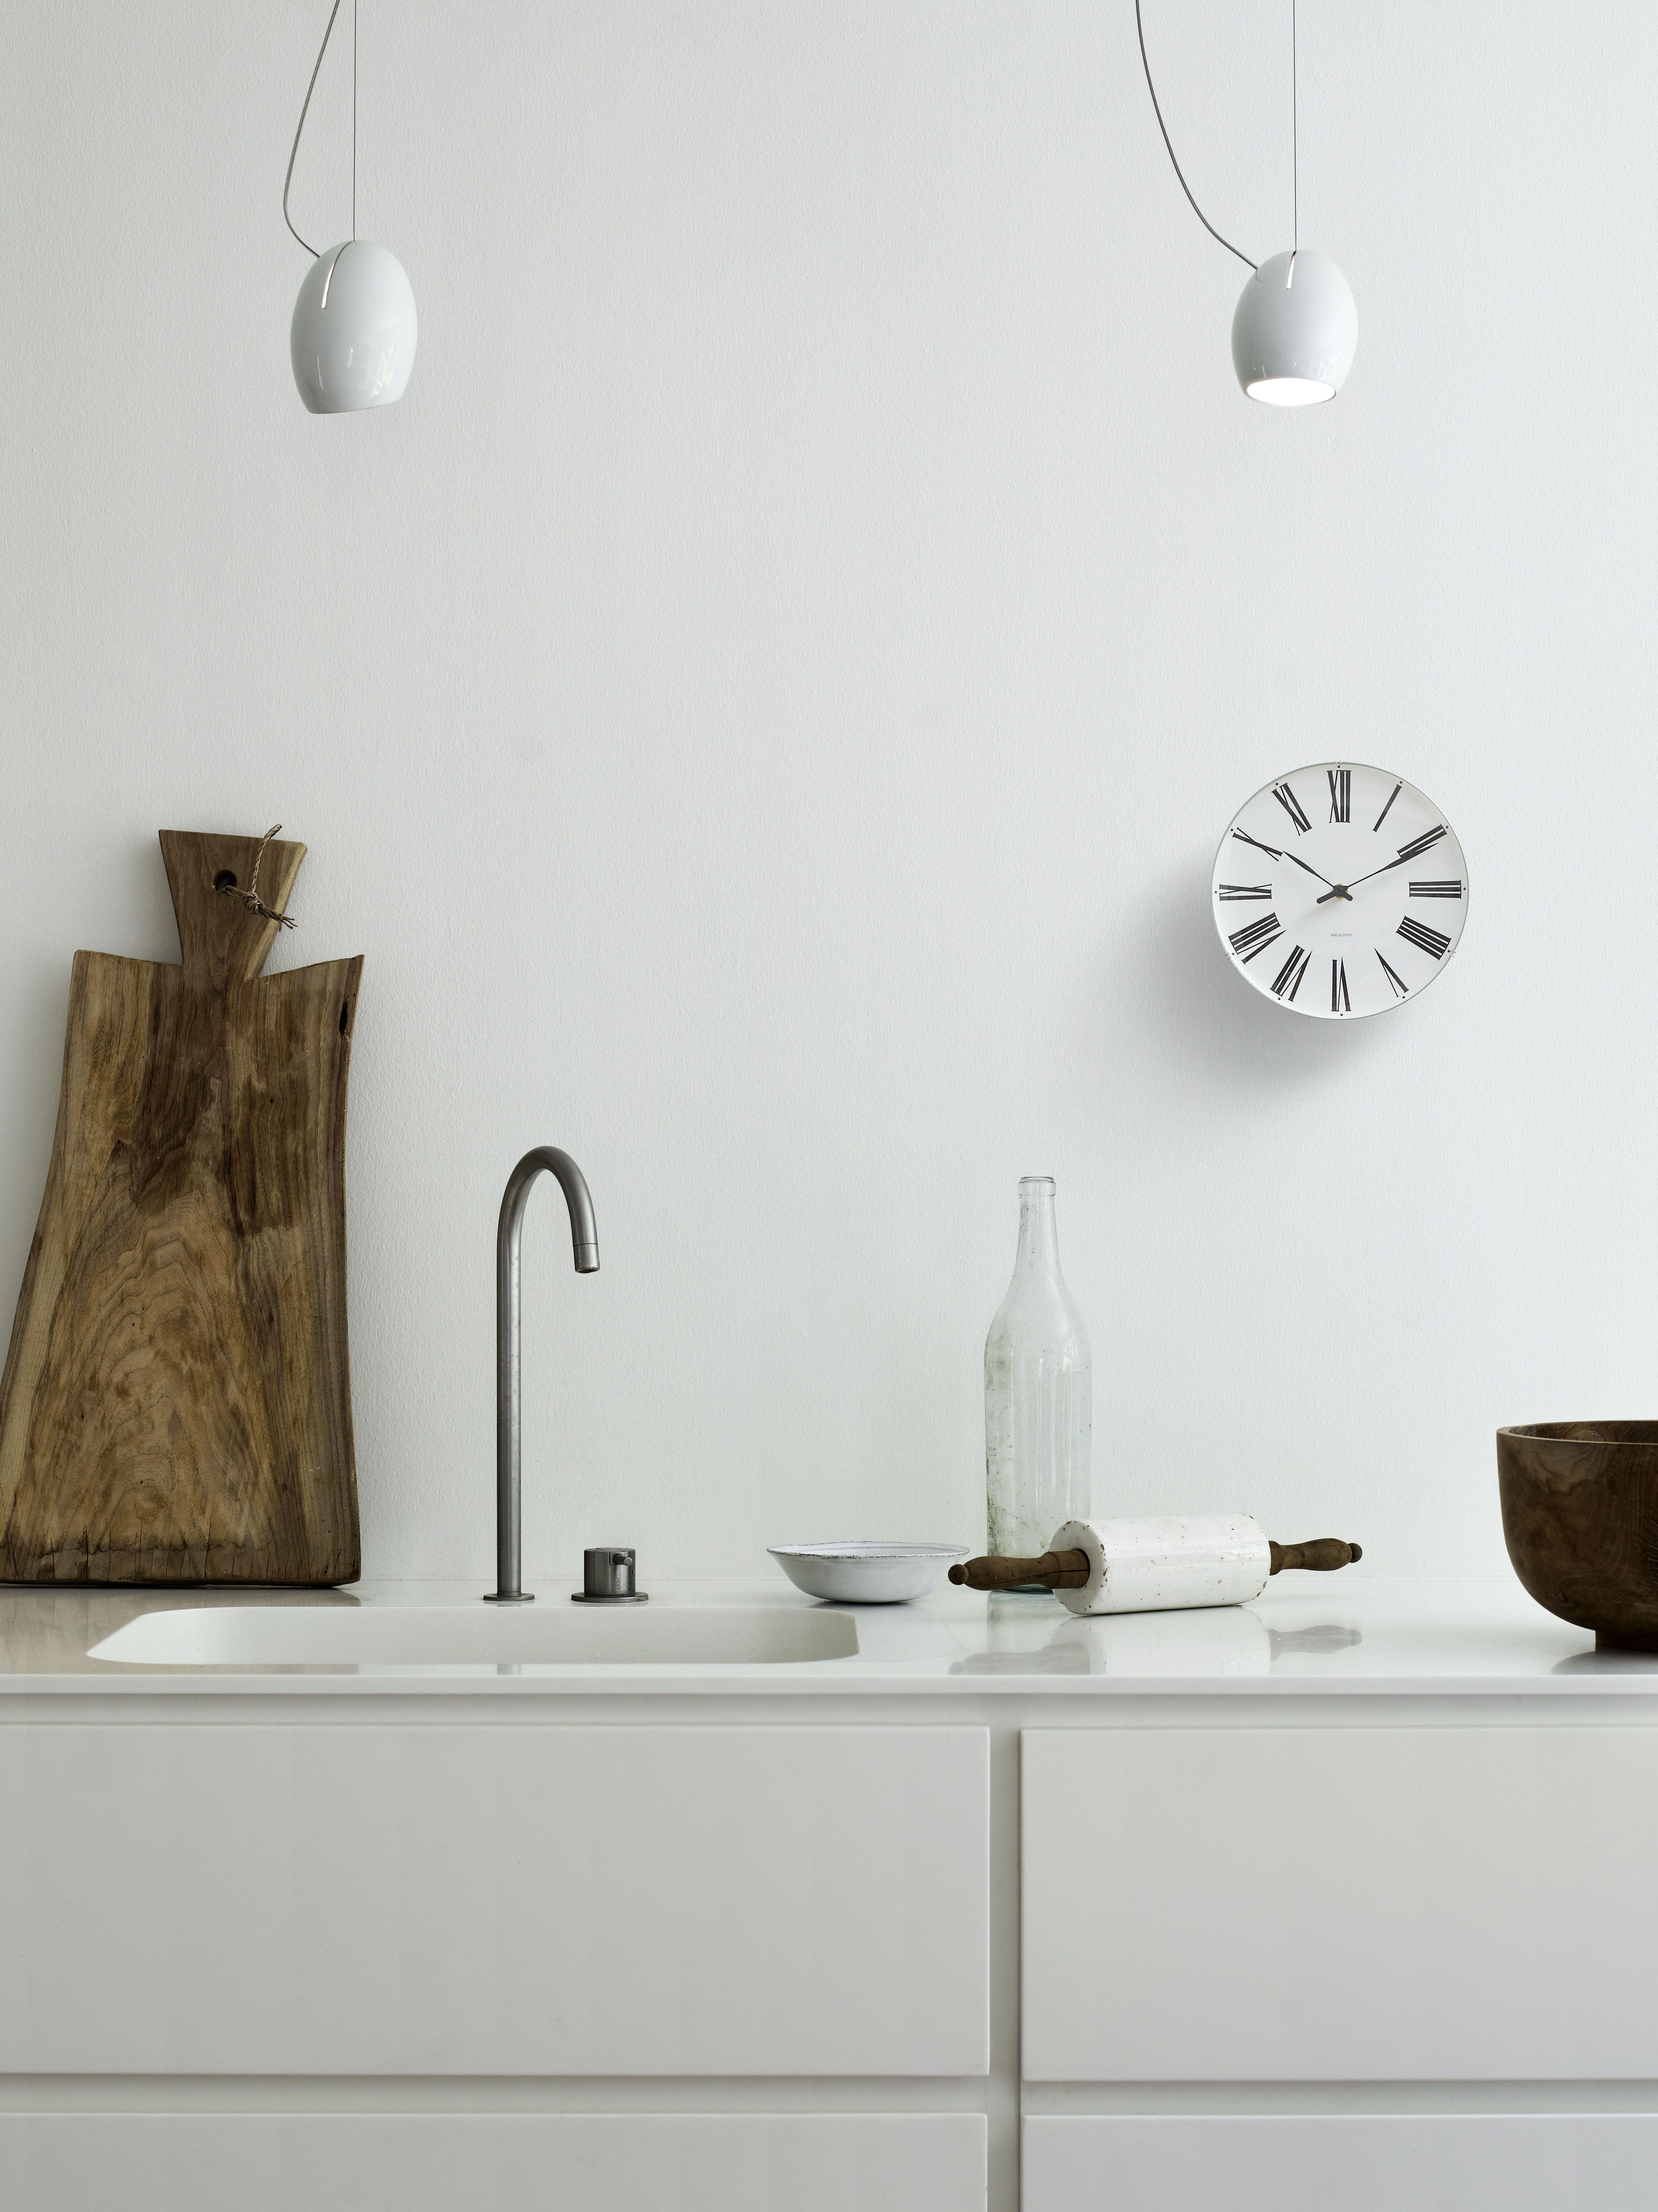 Arne jacobsen interior arne jacobsen wall clock  scandinavian living  pinterest  arne